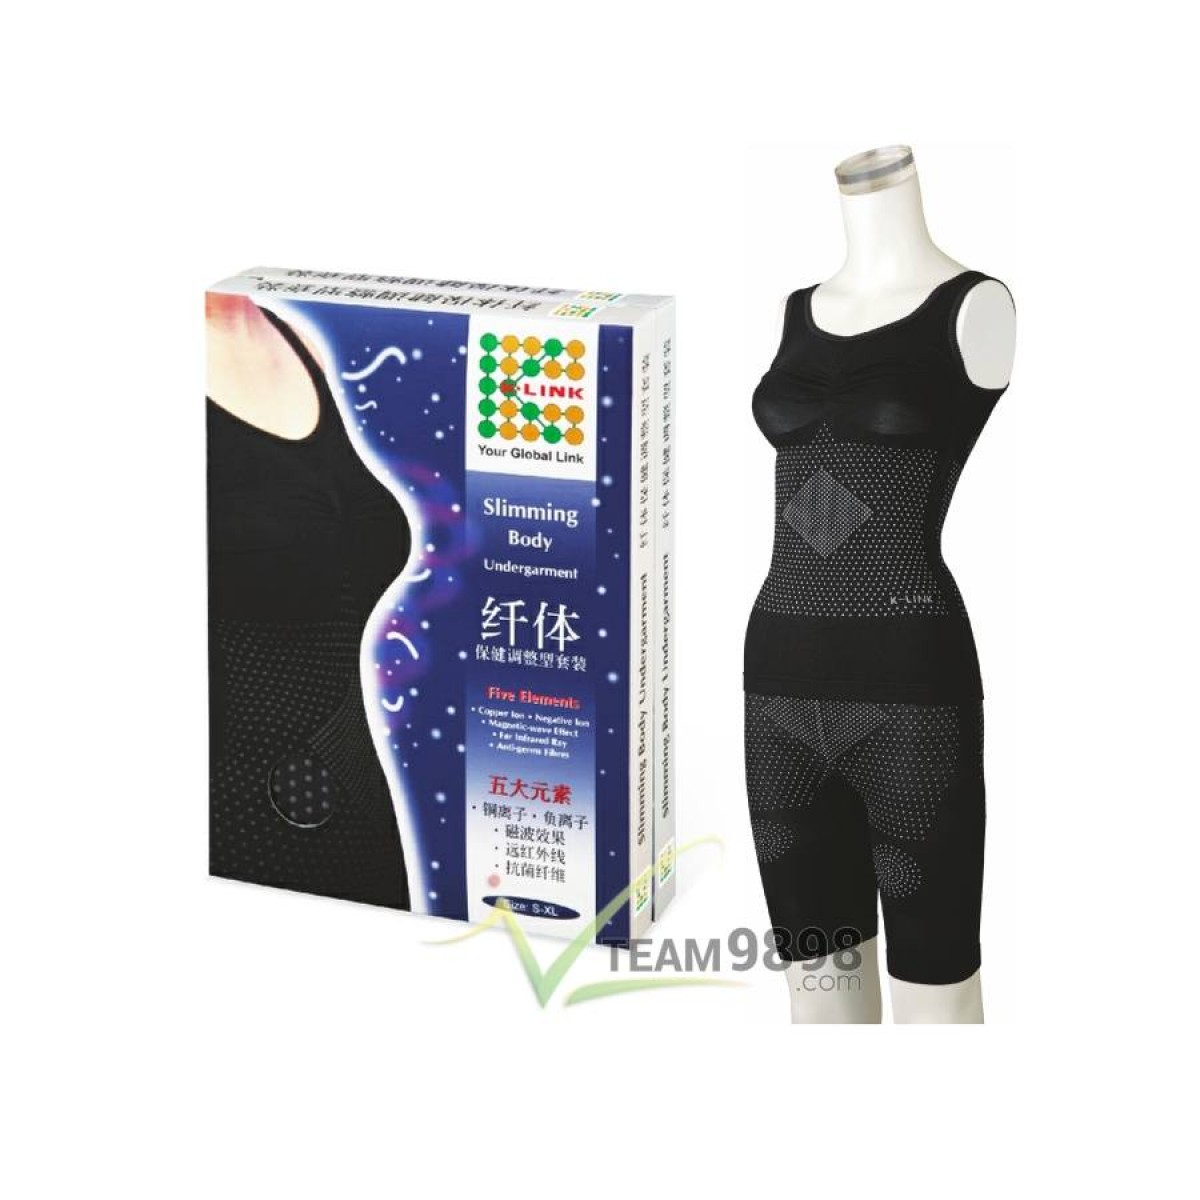 Slimming Body Undergarment